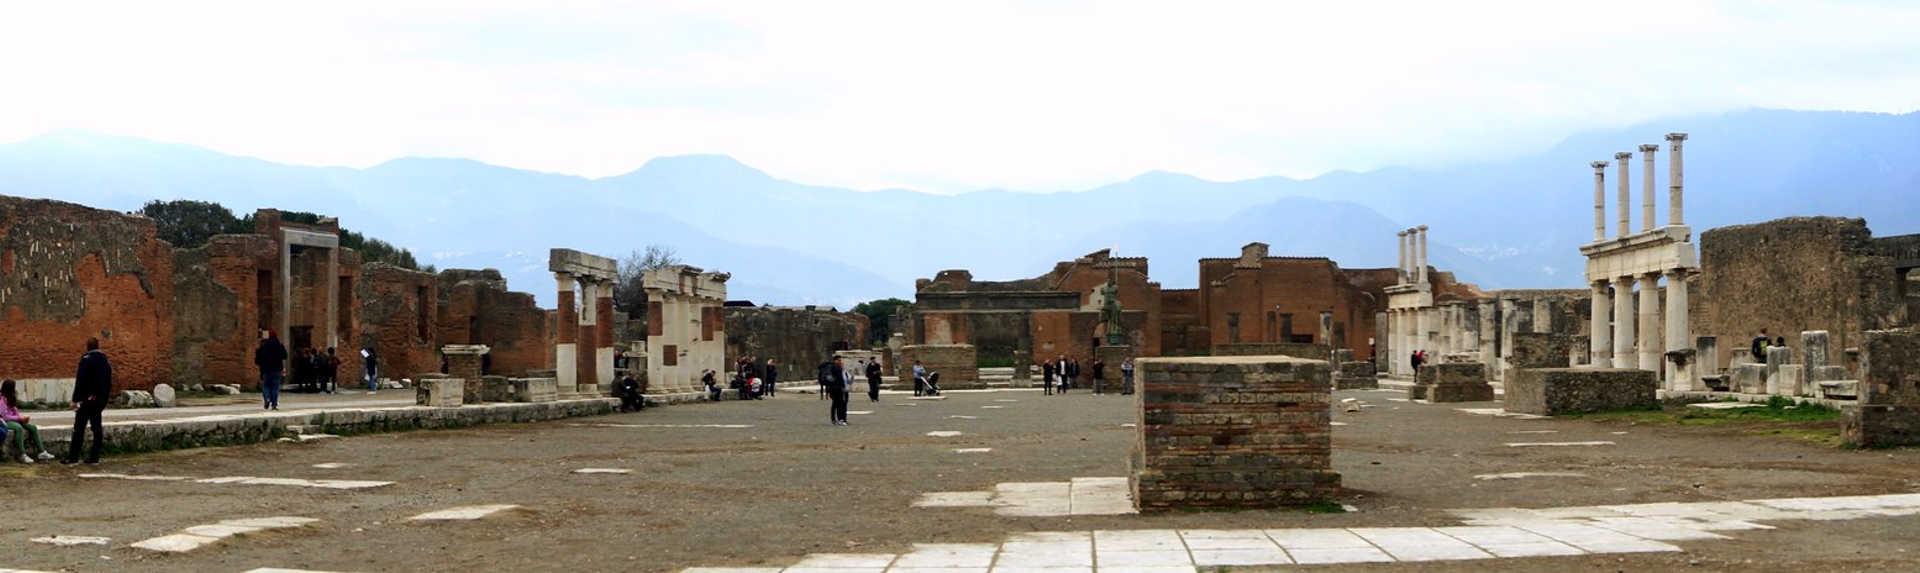 How many bodies were found at Pompeii?